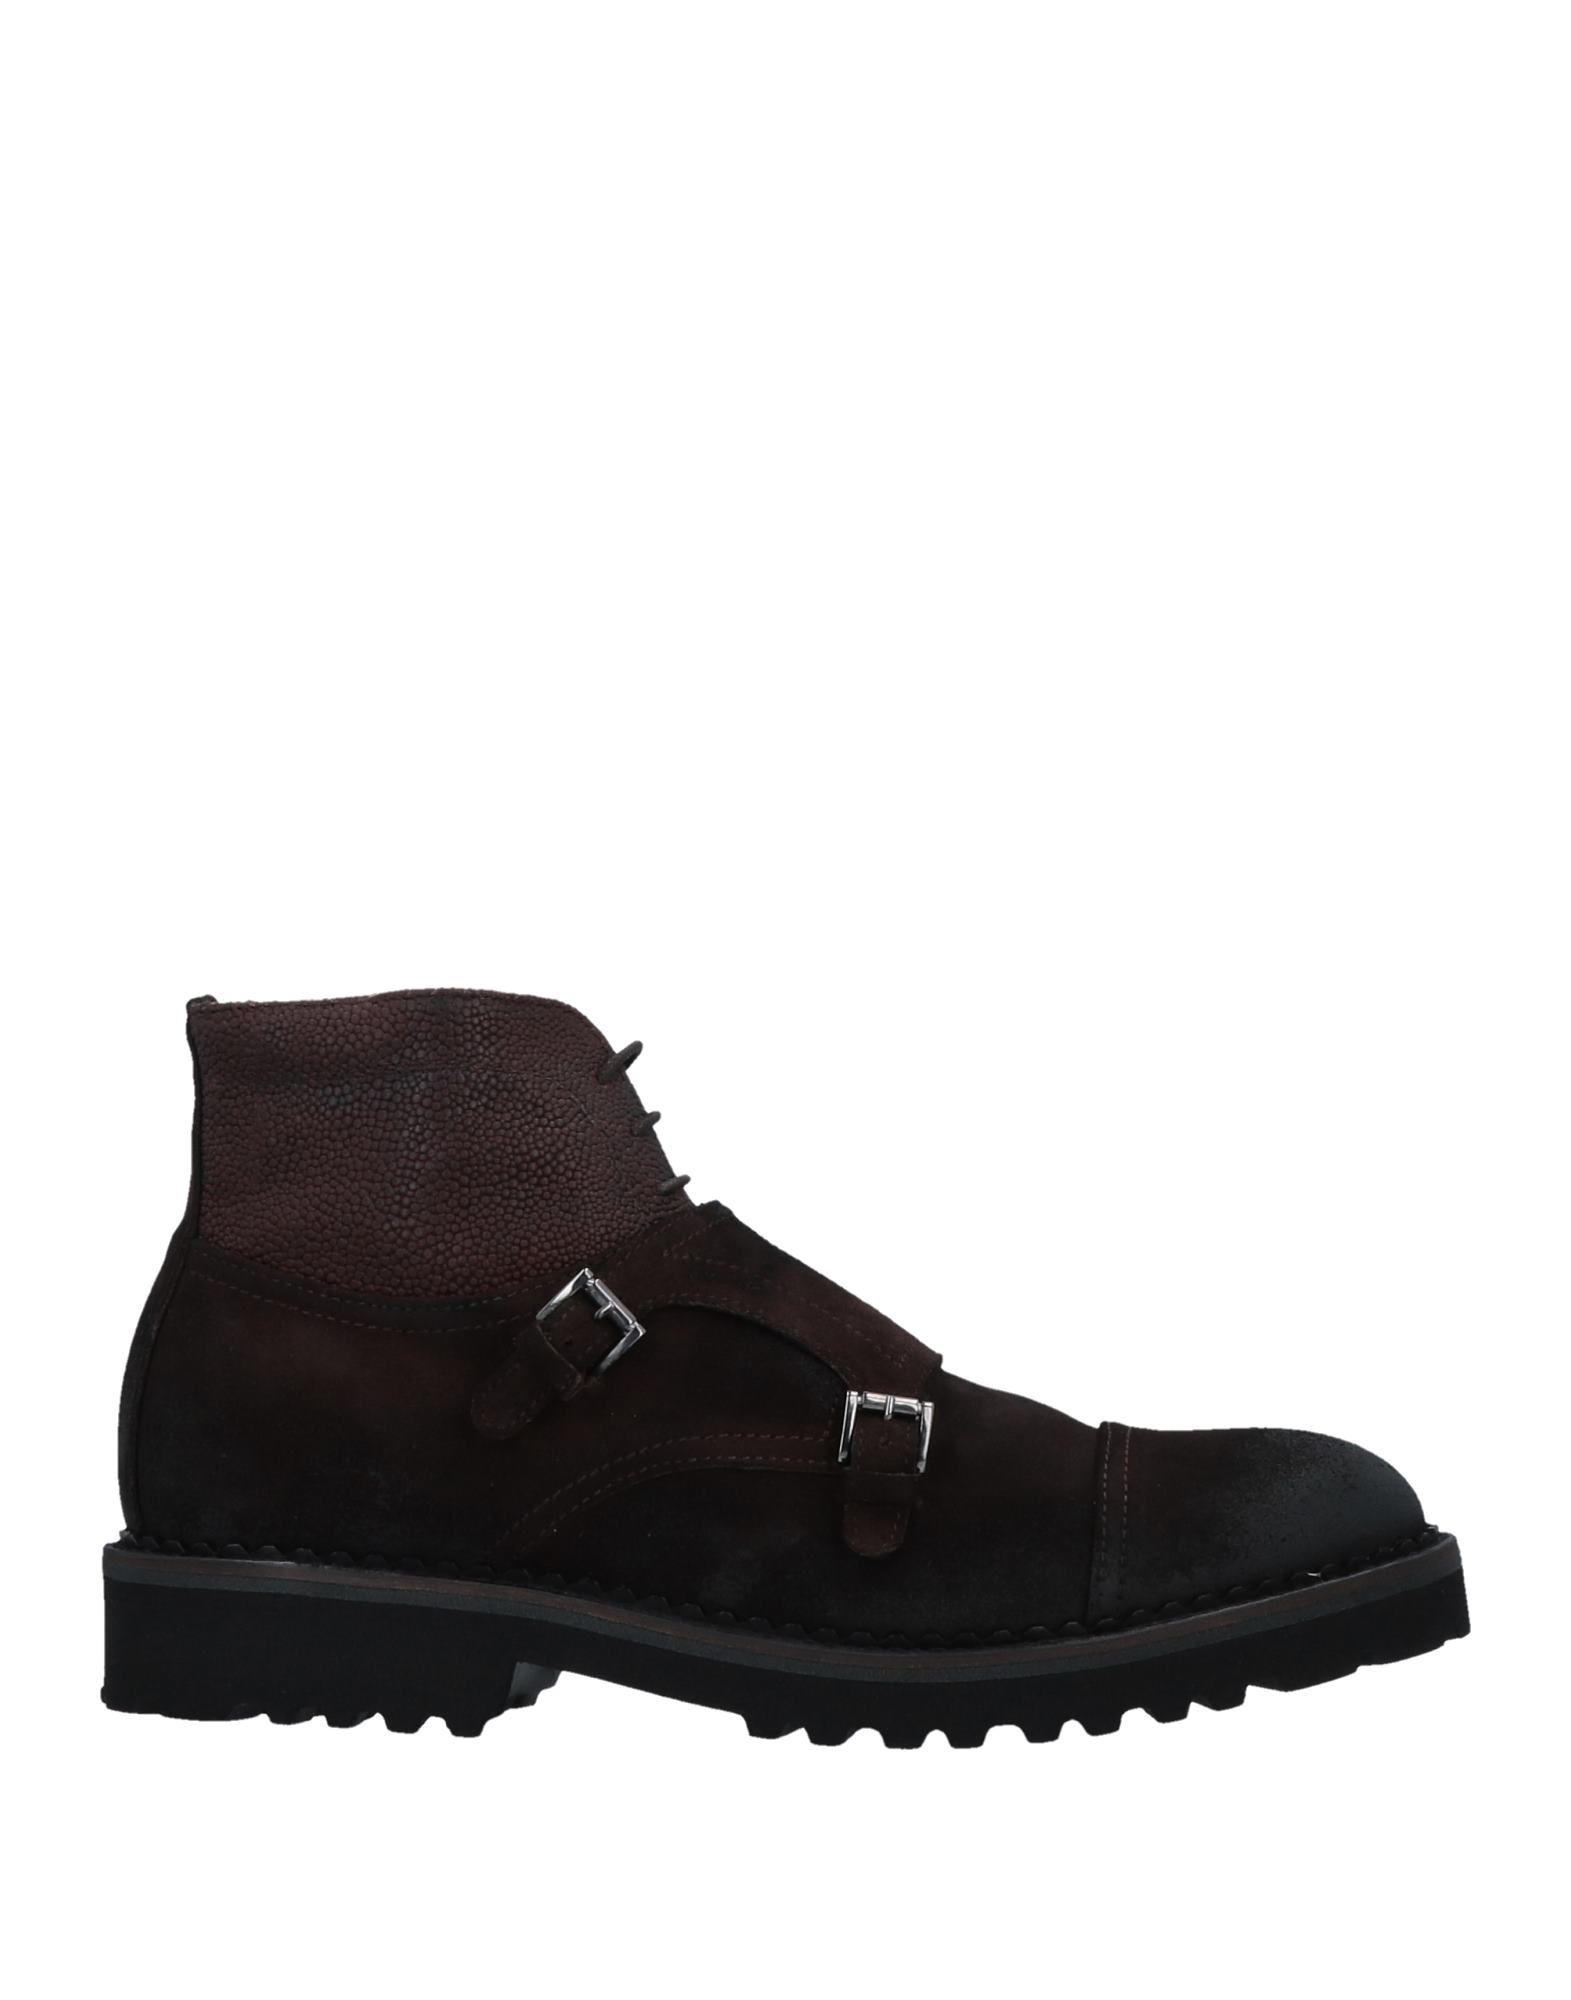 Eveet Boots Boots - Men Eveet Boots Eveet online on  Australia - 11511112AV 46b326